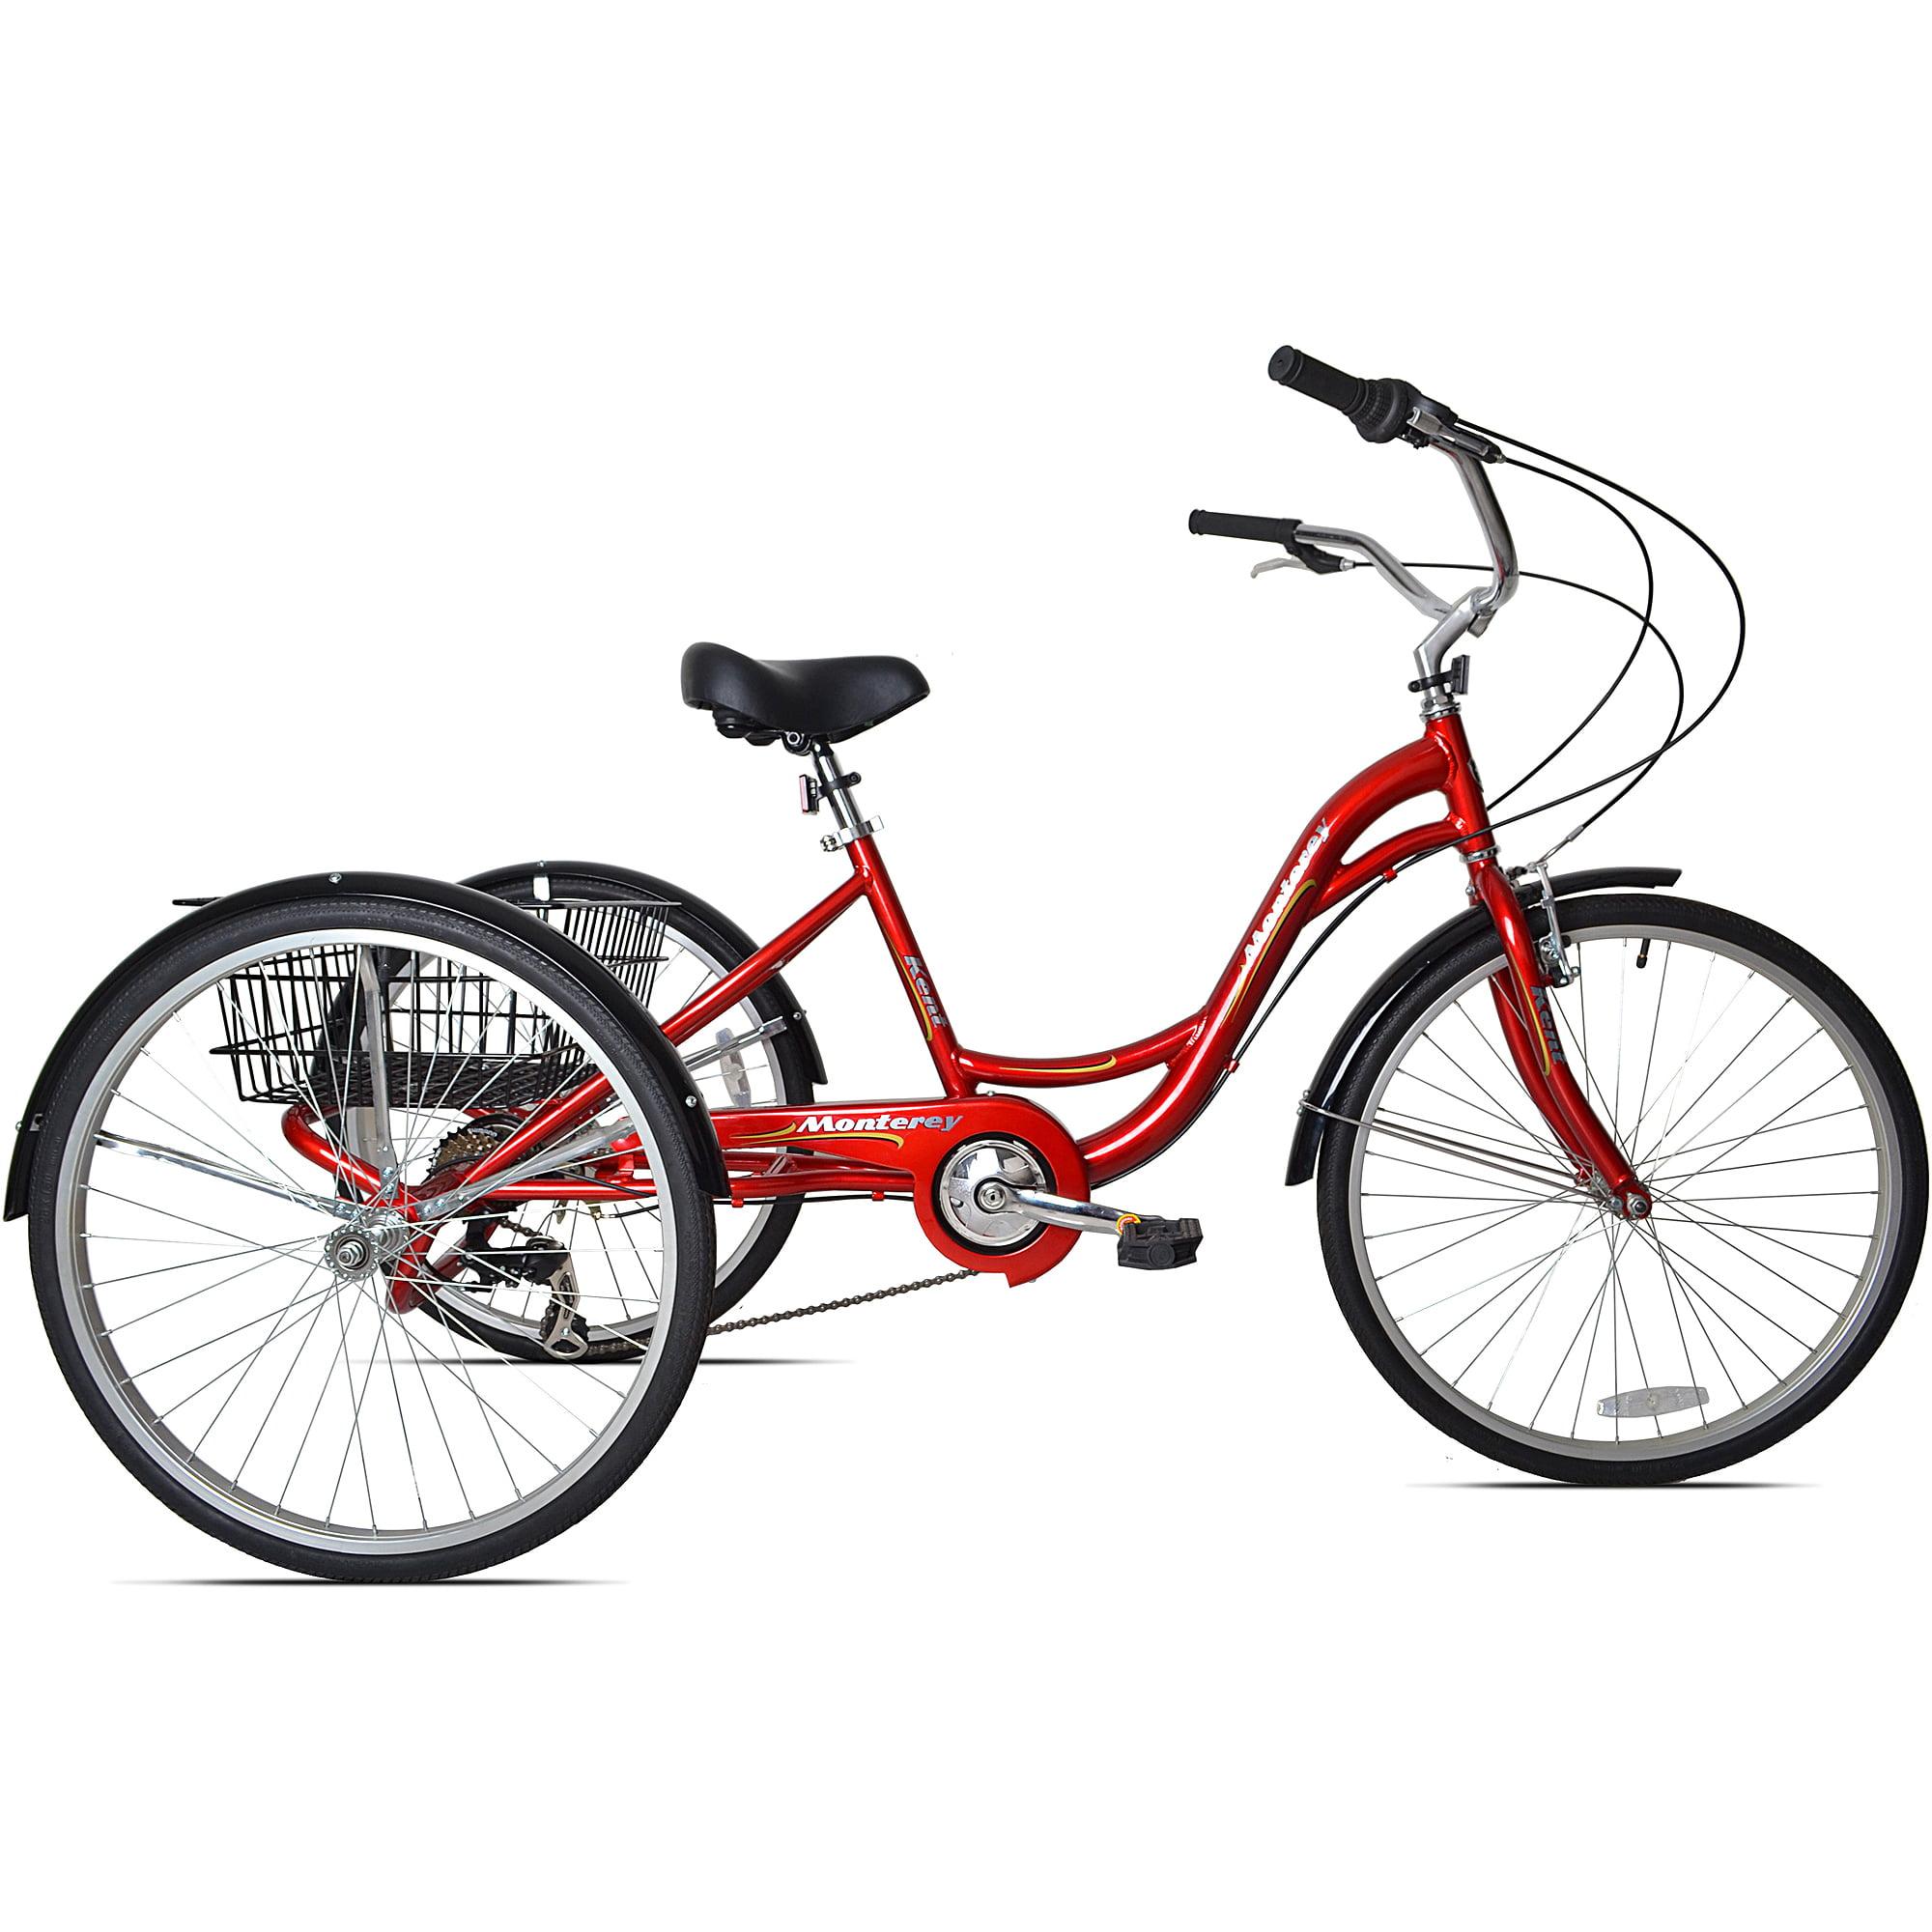 Schwinn Meridian Tricycle 26 Inch Wheels Dark Silver